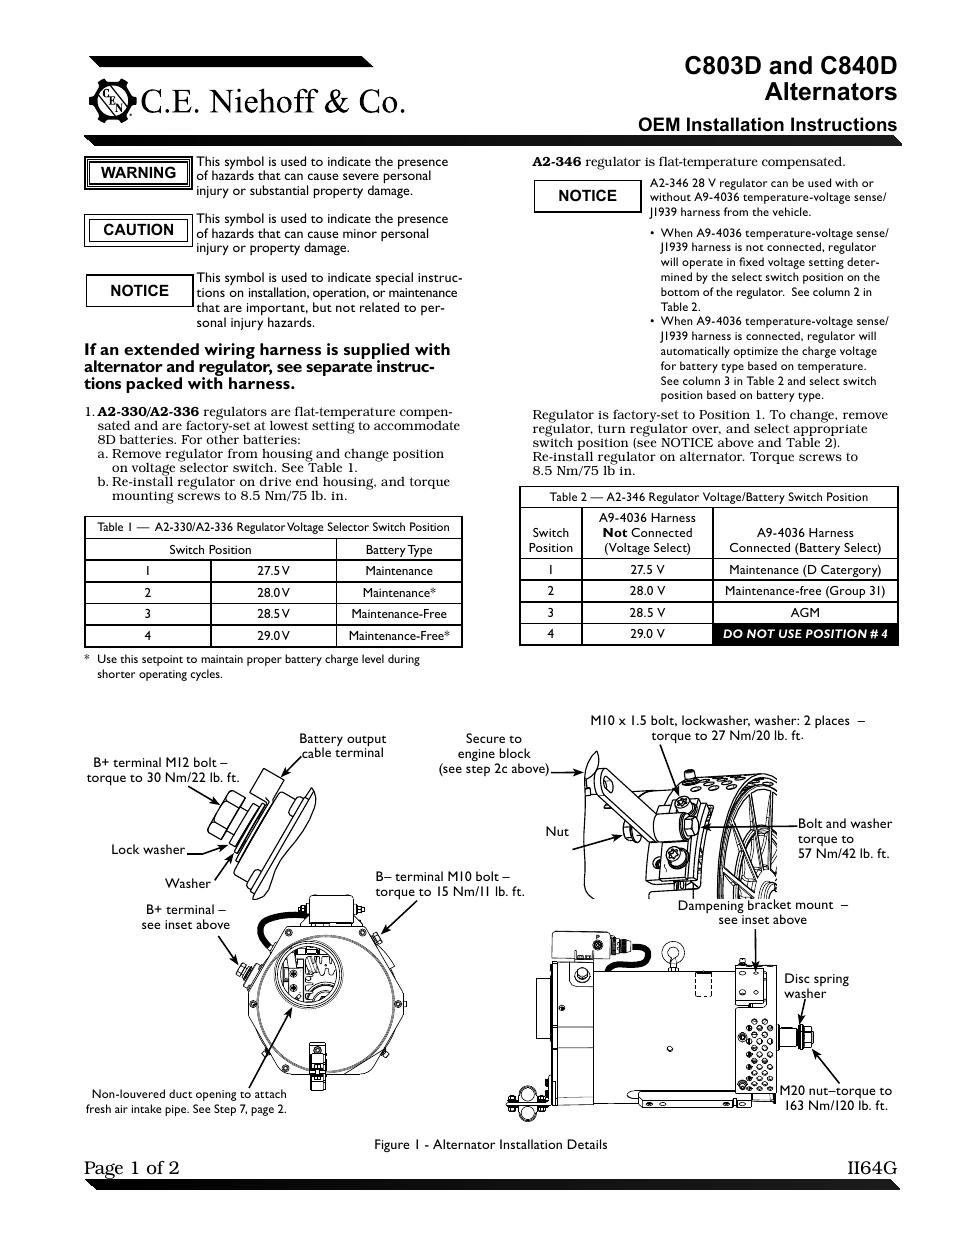 C.E. Niehoff & Co. C803D/C840D Alternator OEM Installation